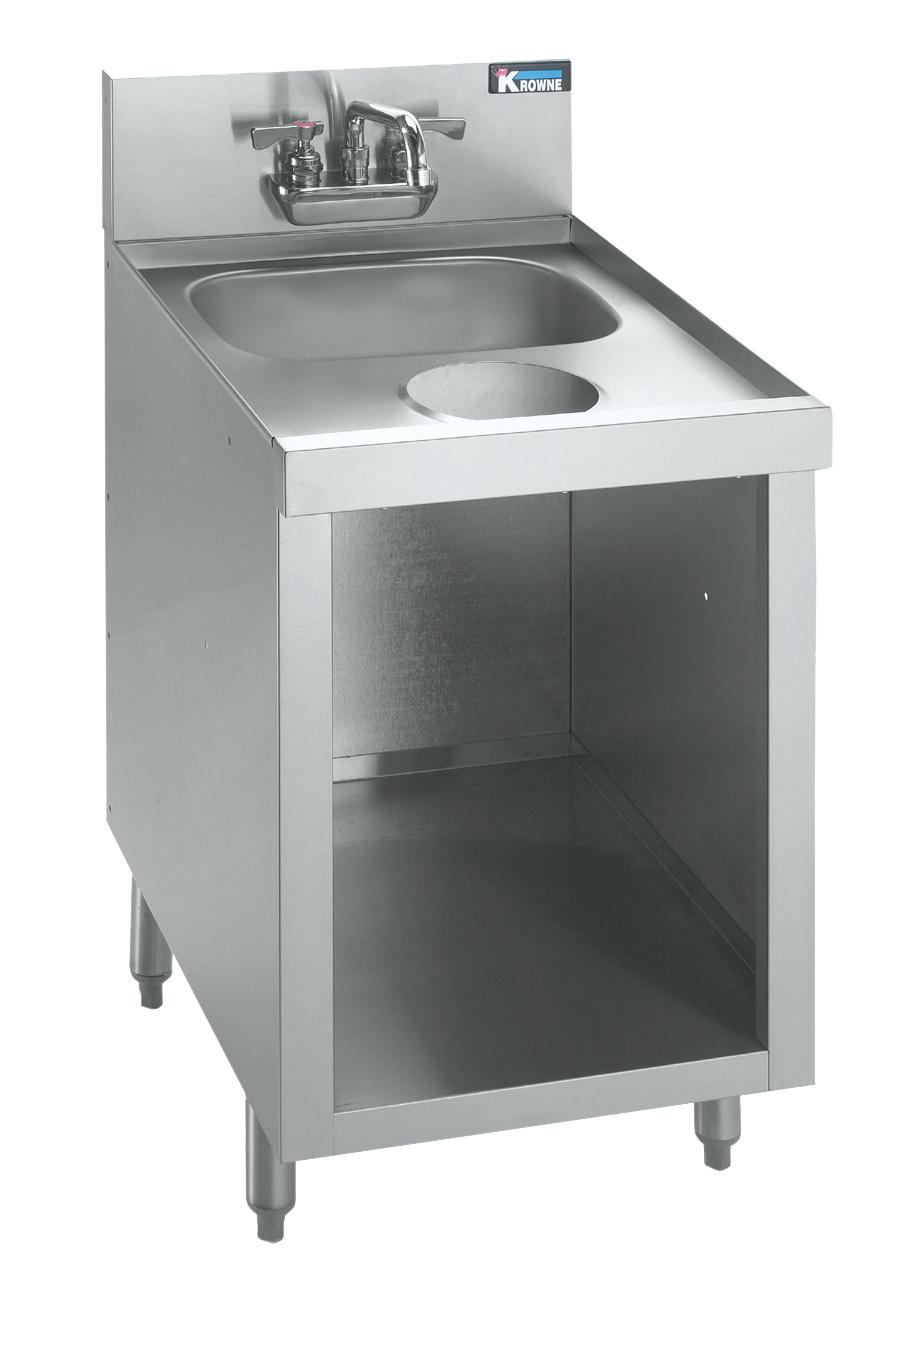 Krowne Metal KR21-S18C underbar hand sink unit